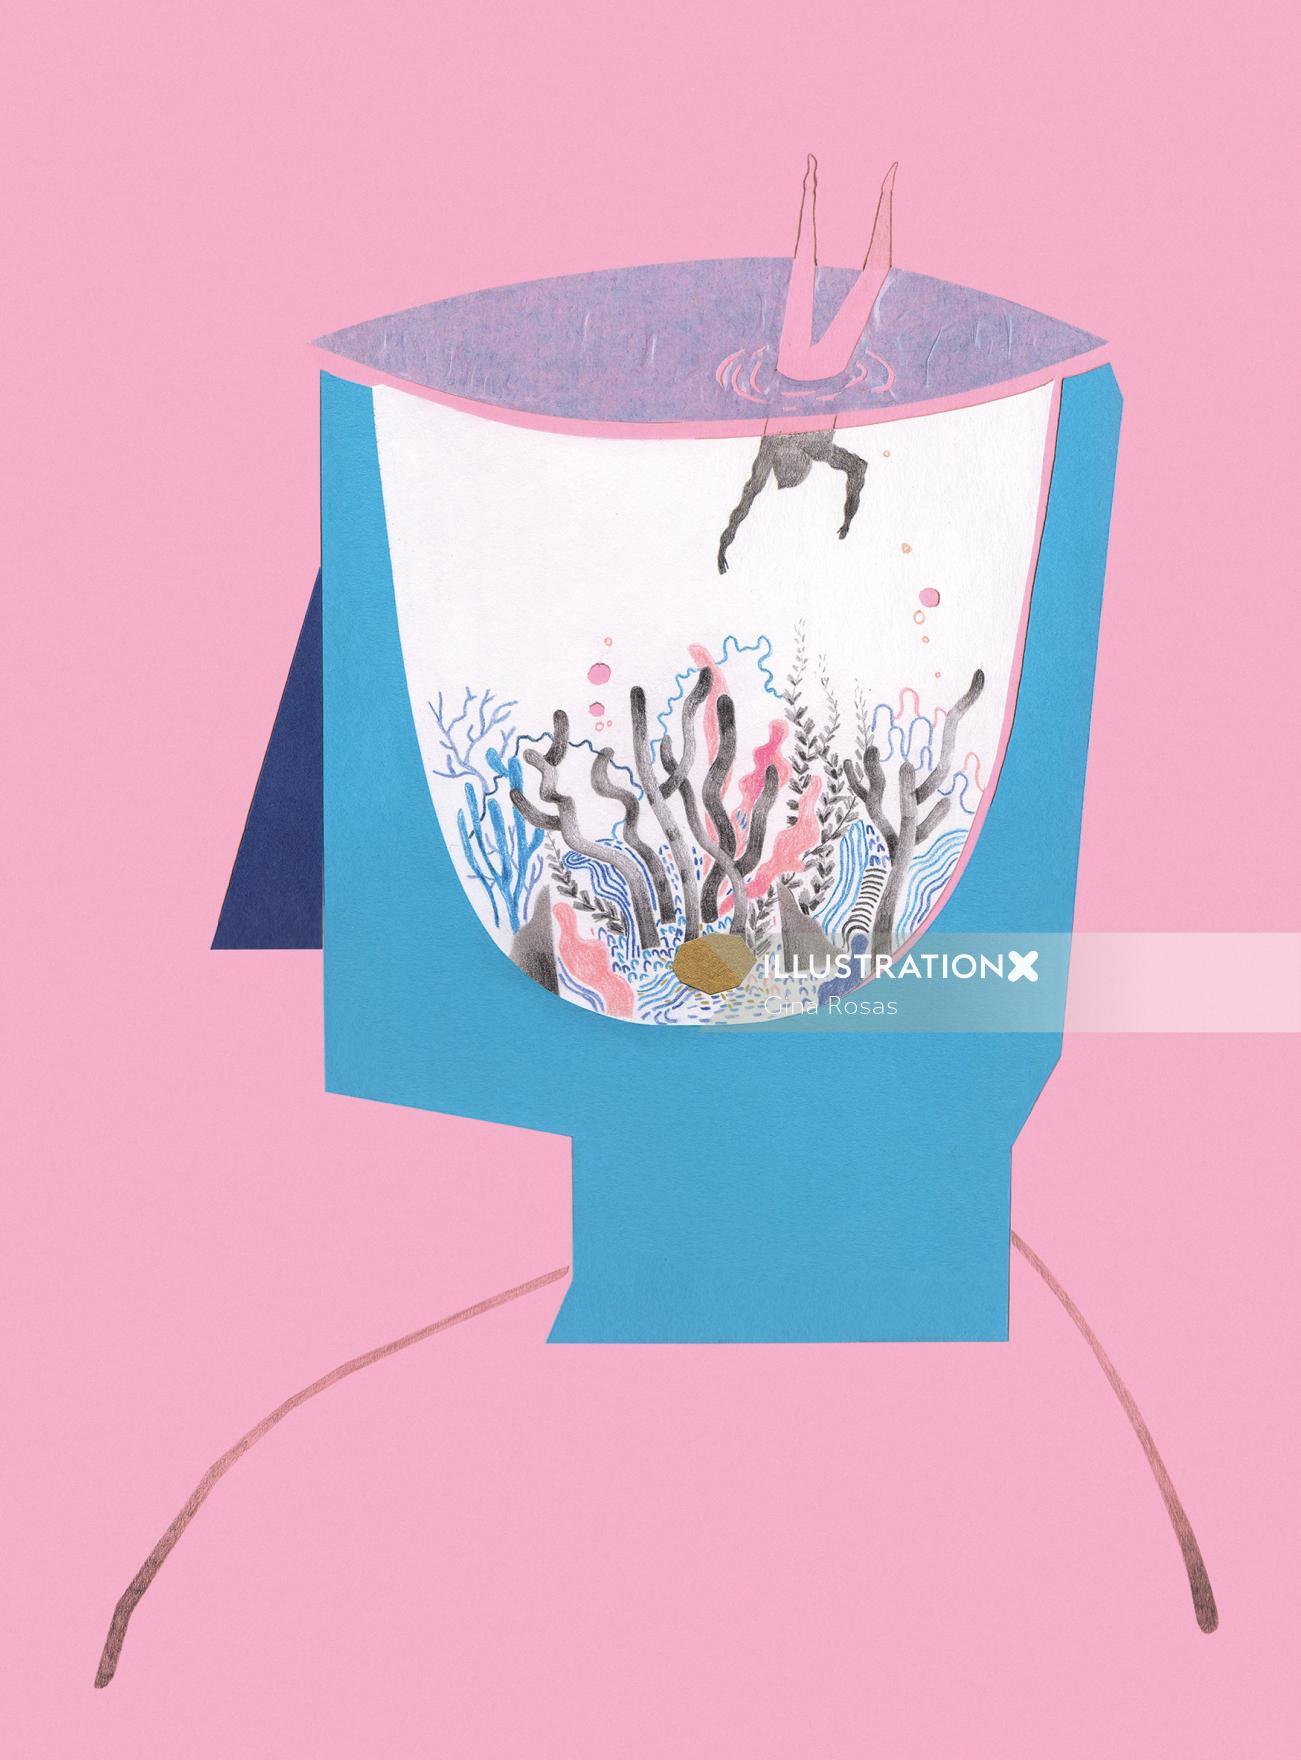 Abstract illustration by Gina Rosas